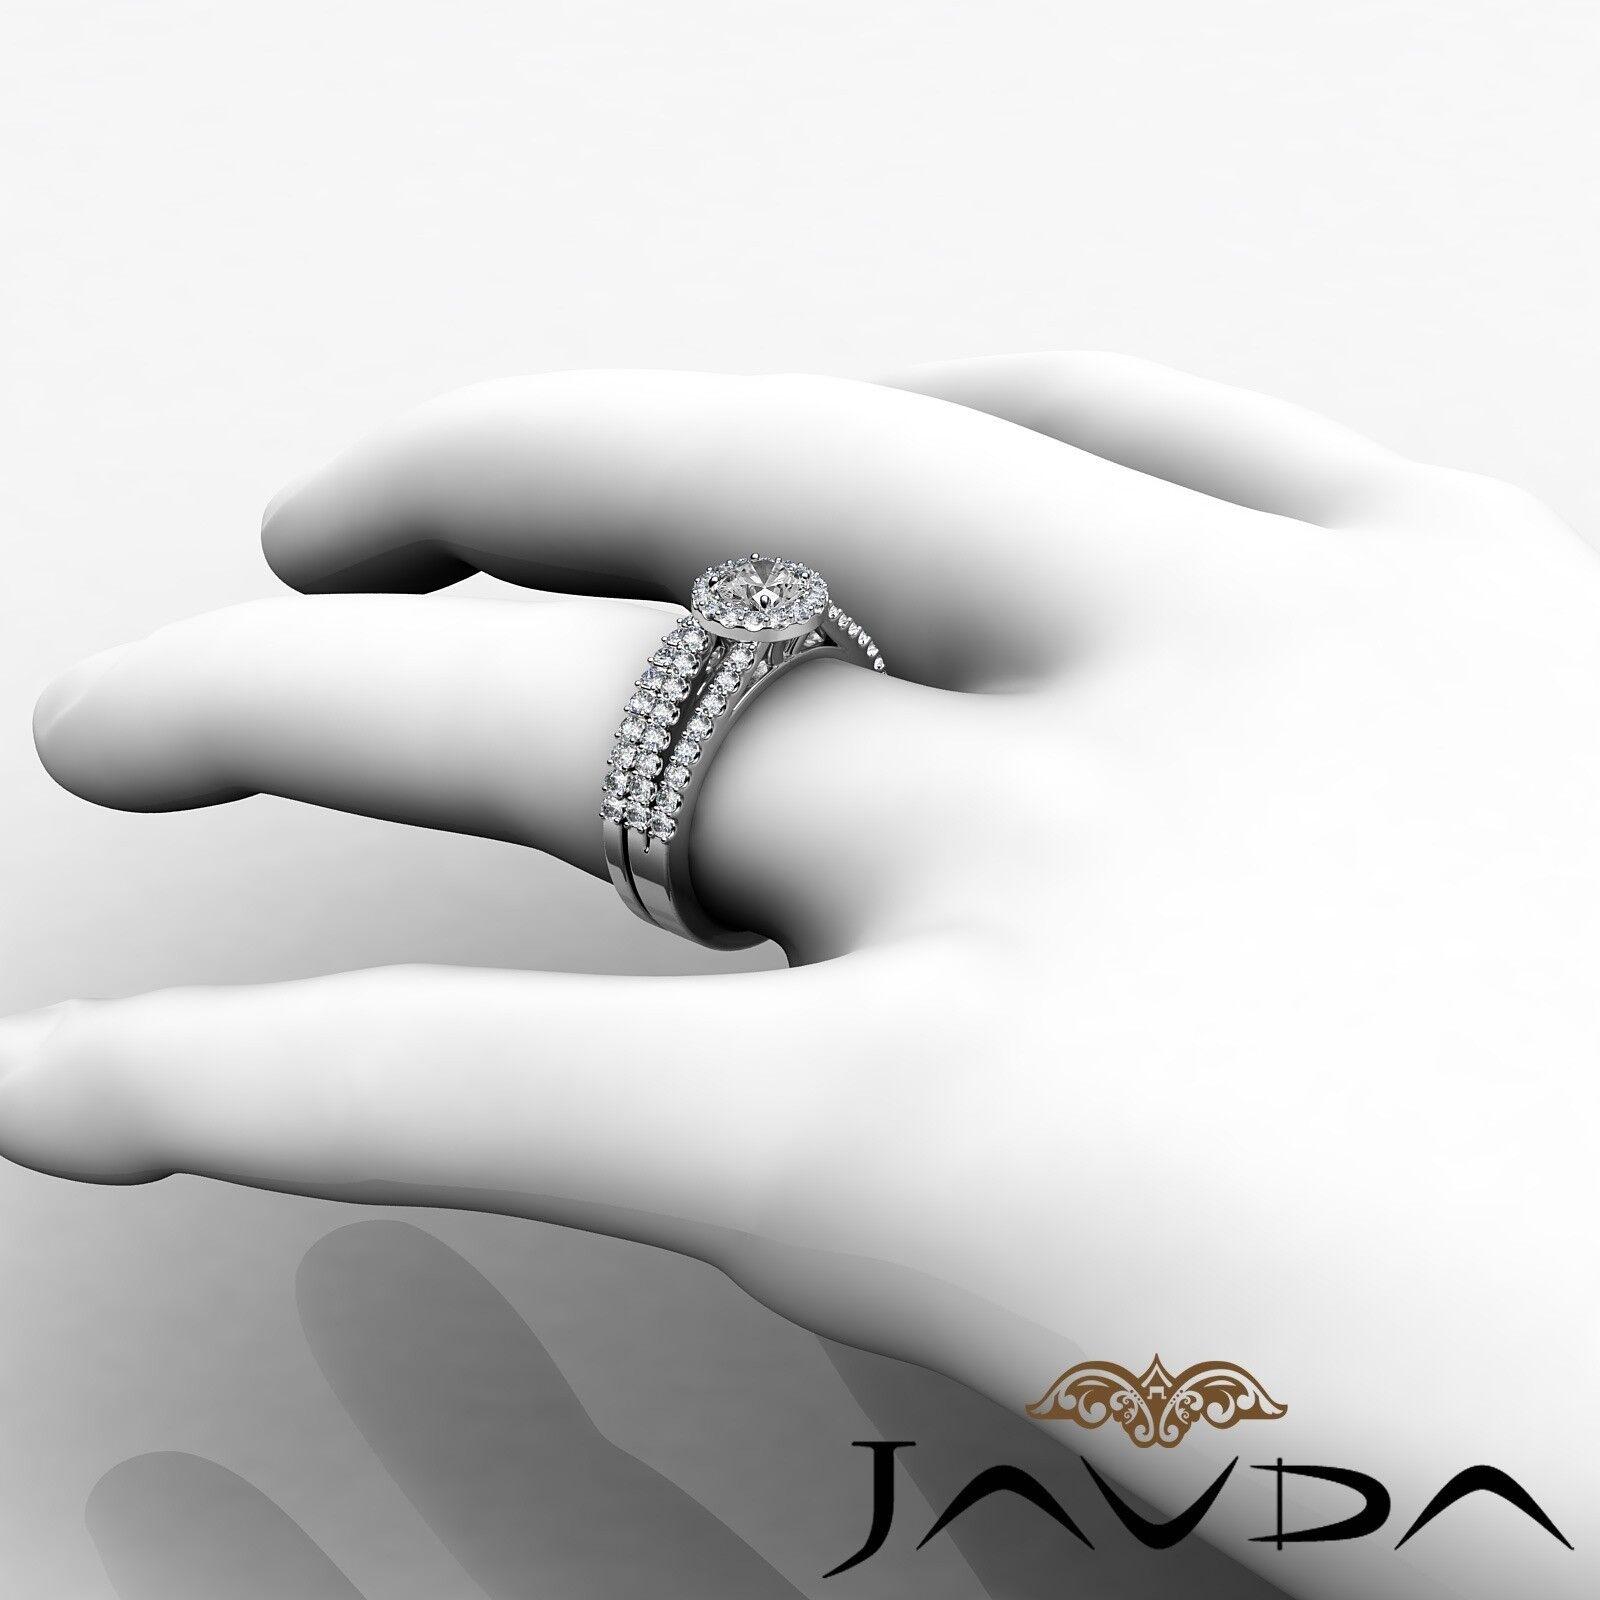 1.85ctw Luxurious Wedding Bridal Round Diamond Engagement Ring GIA G-VVS1 W Gold 5